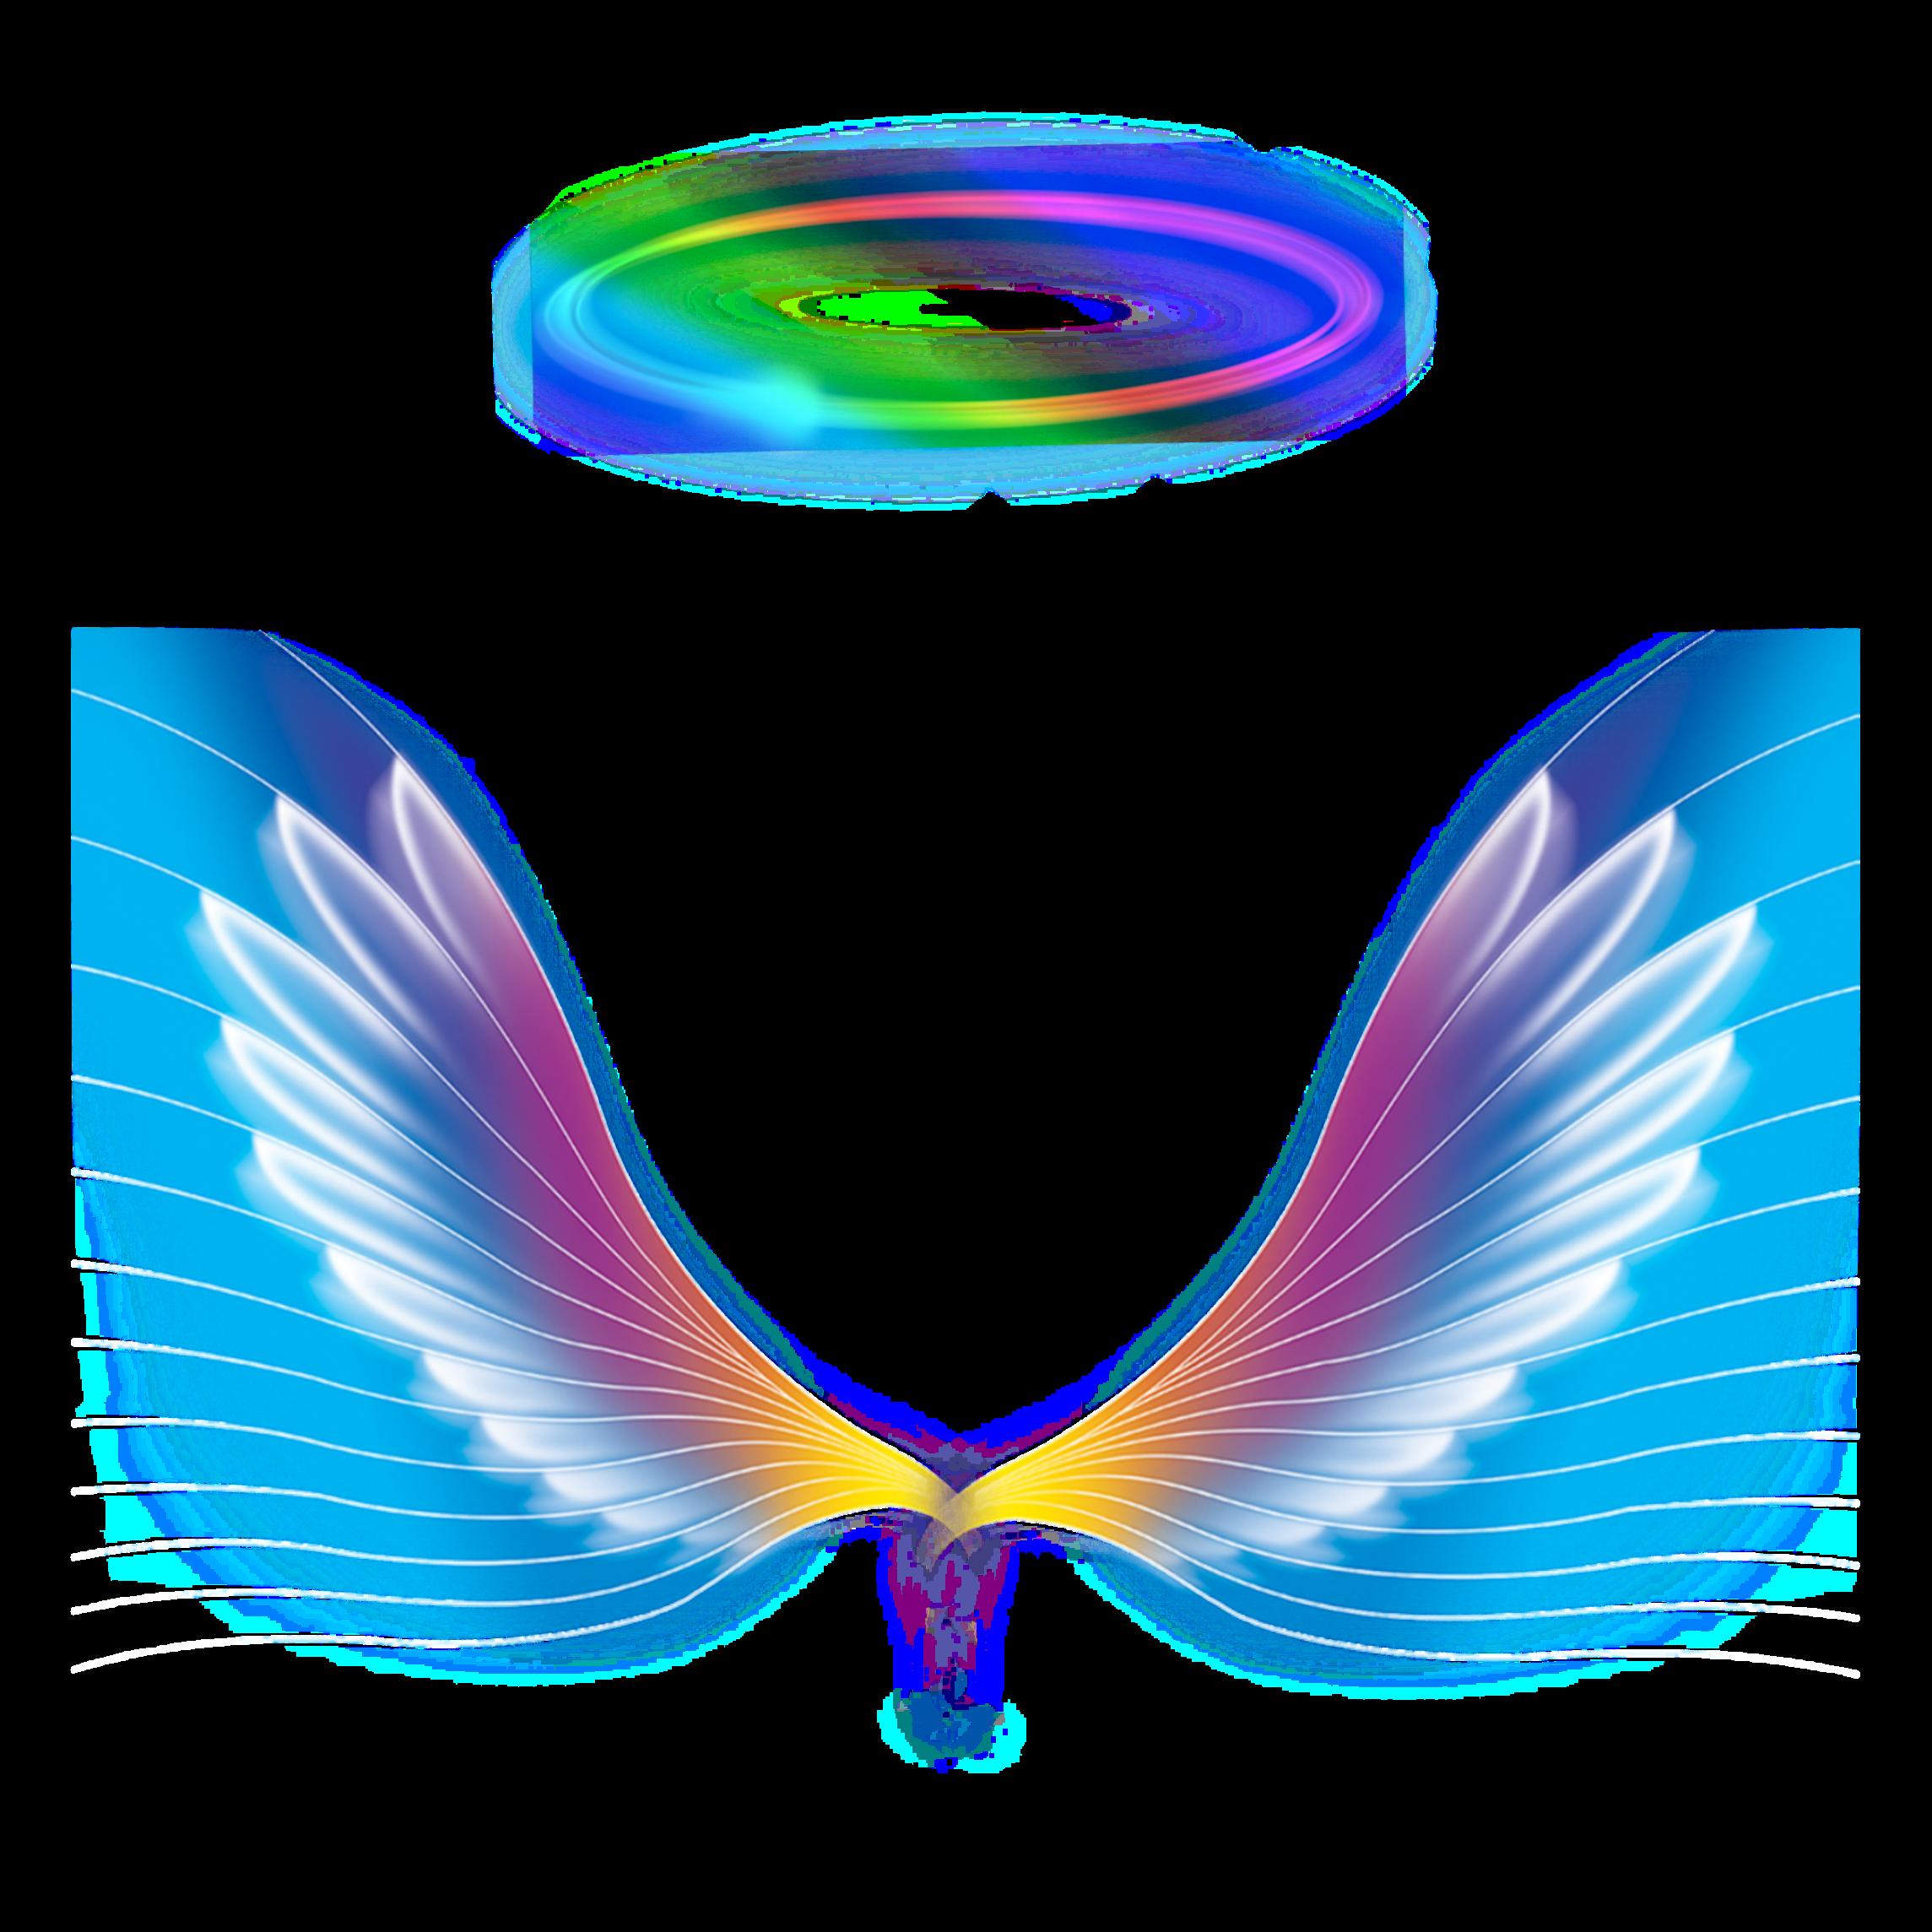 Freetoedit Angel Wings Halo Rainbow Colorful Galaxy Colorfulangel Colorfulwings Colorfulhalo Remixi Angel Wings Images Angel Wings Halo Halo Tattoo